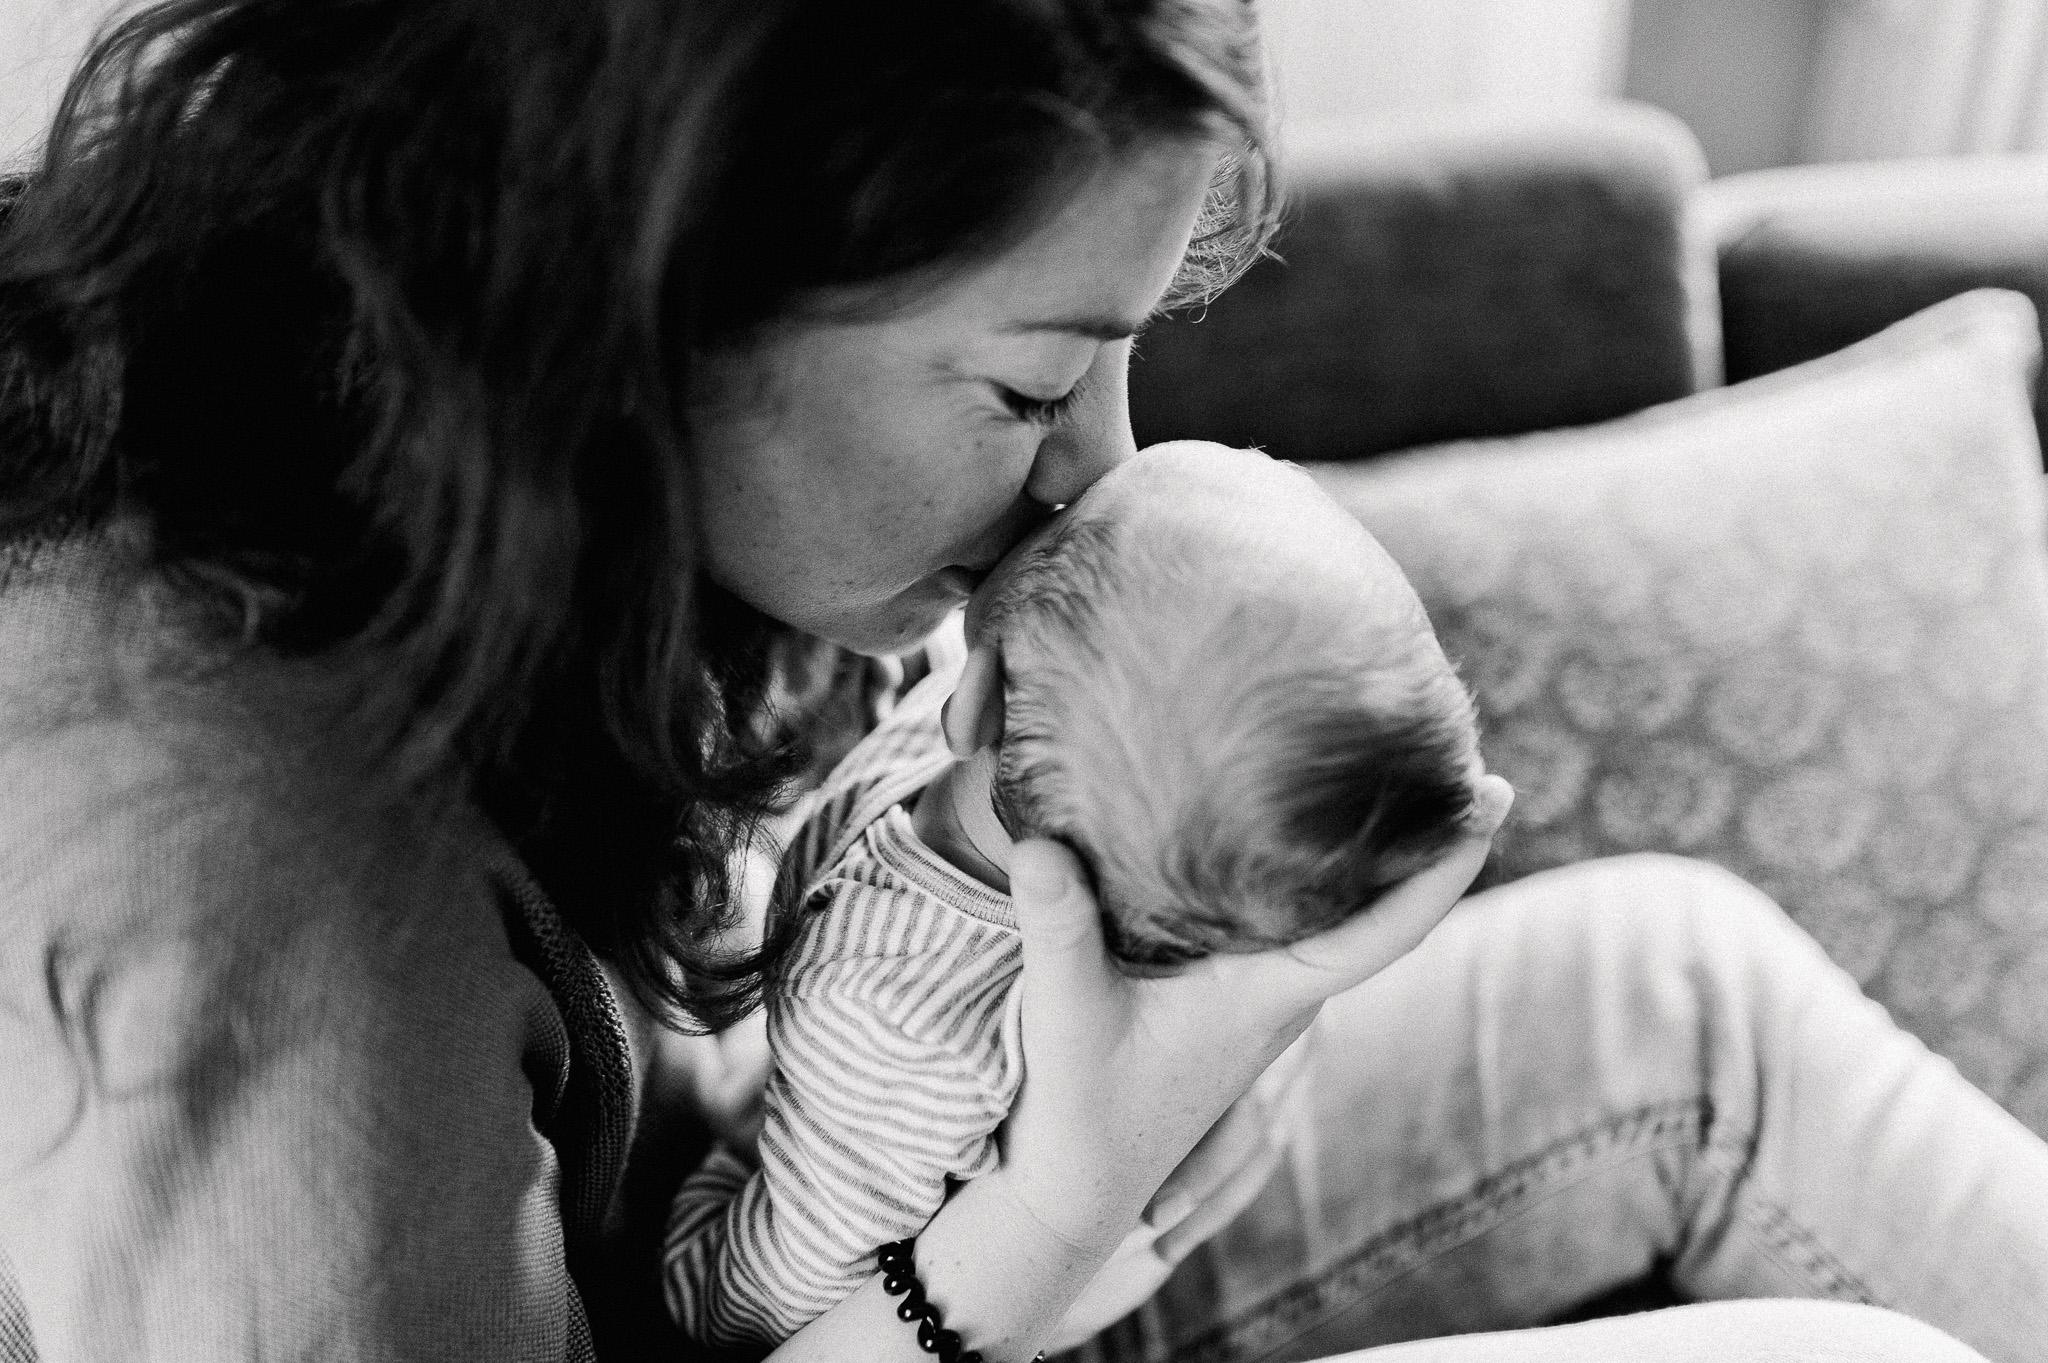 Anna-Hari-Photography-Familienshooting-Mannheim-18.jpg